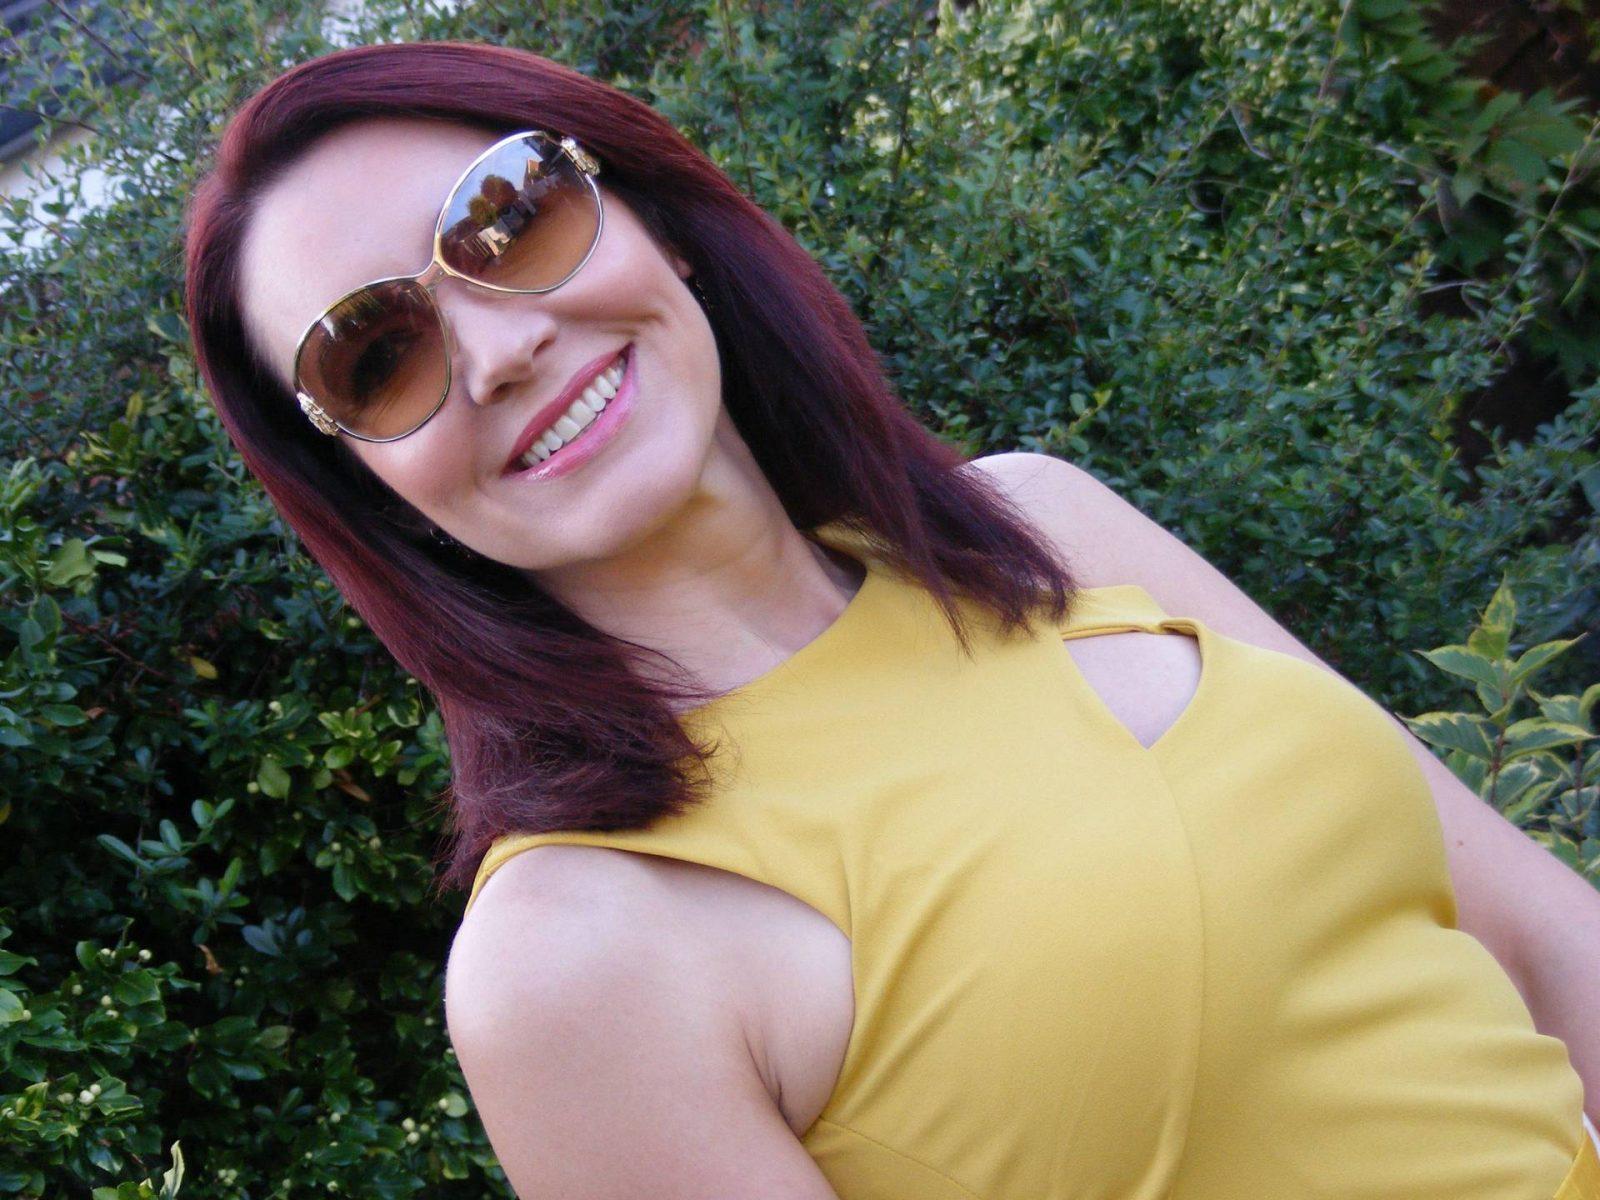 Jane Norman yellow top Roberto Cavalli sunglasses